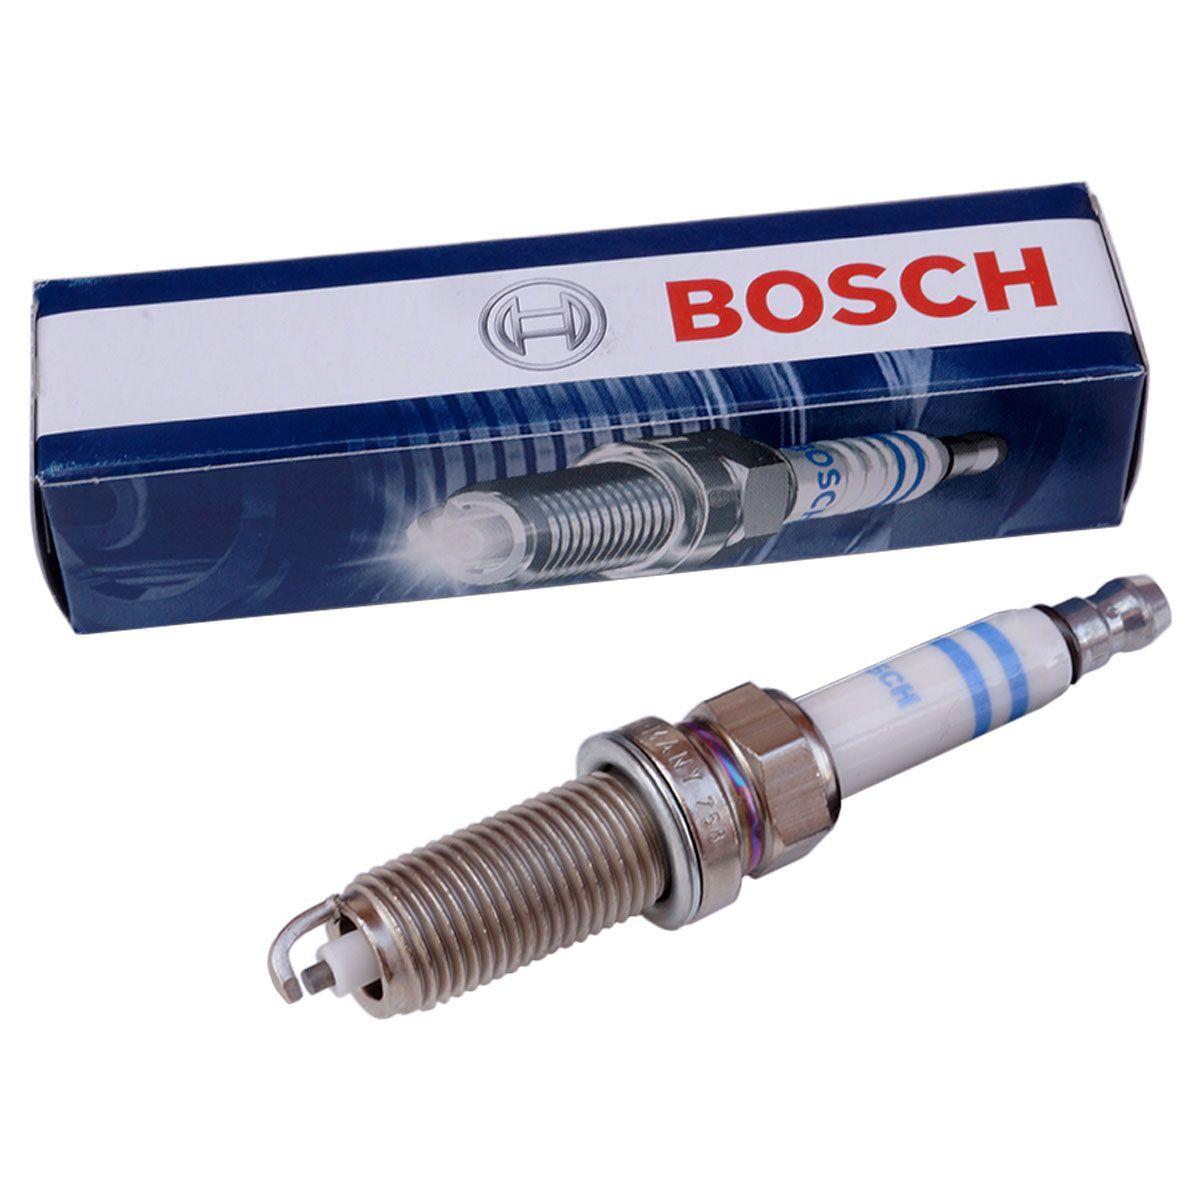 Vela Ignição VR6NE Bosch Ren Kwid Logan Sandero 1.0 12V 3cil